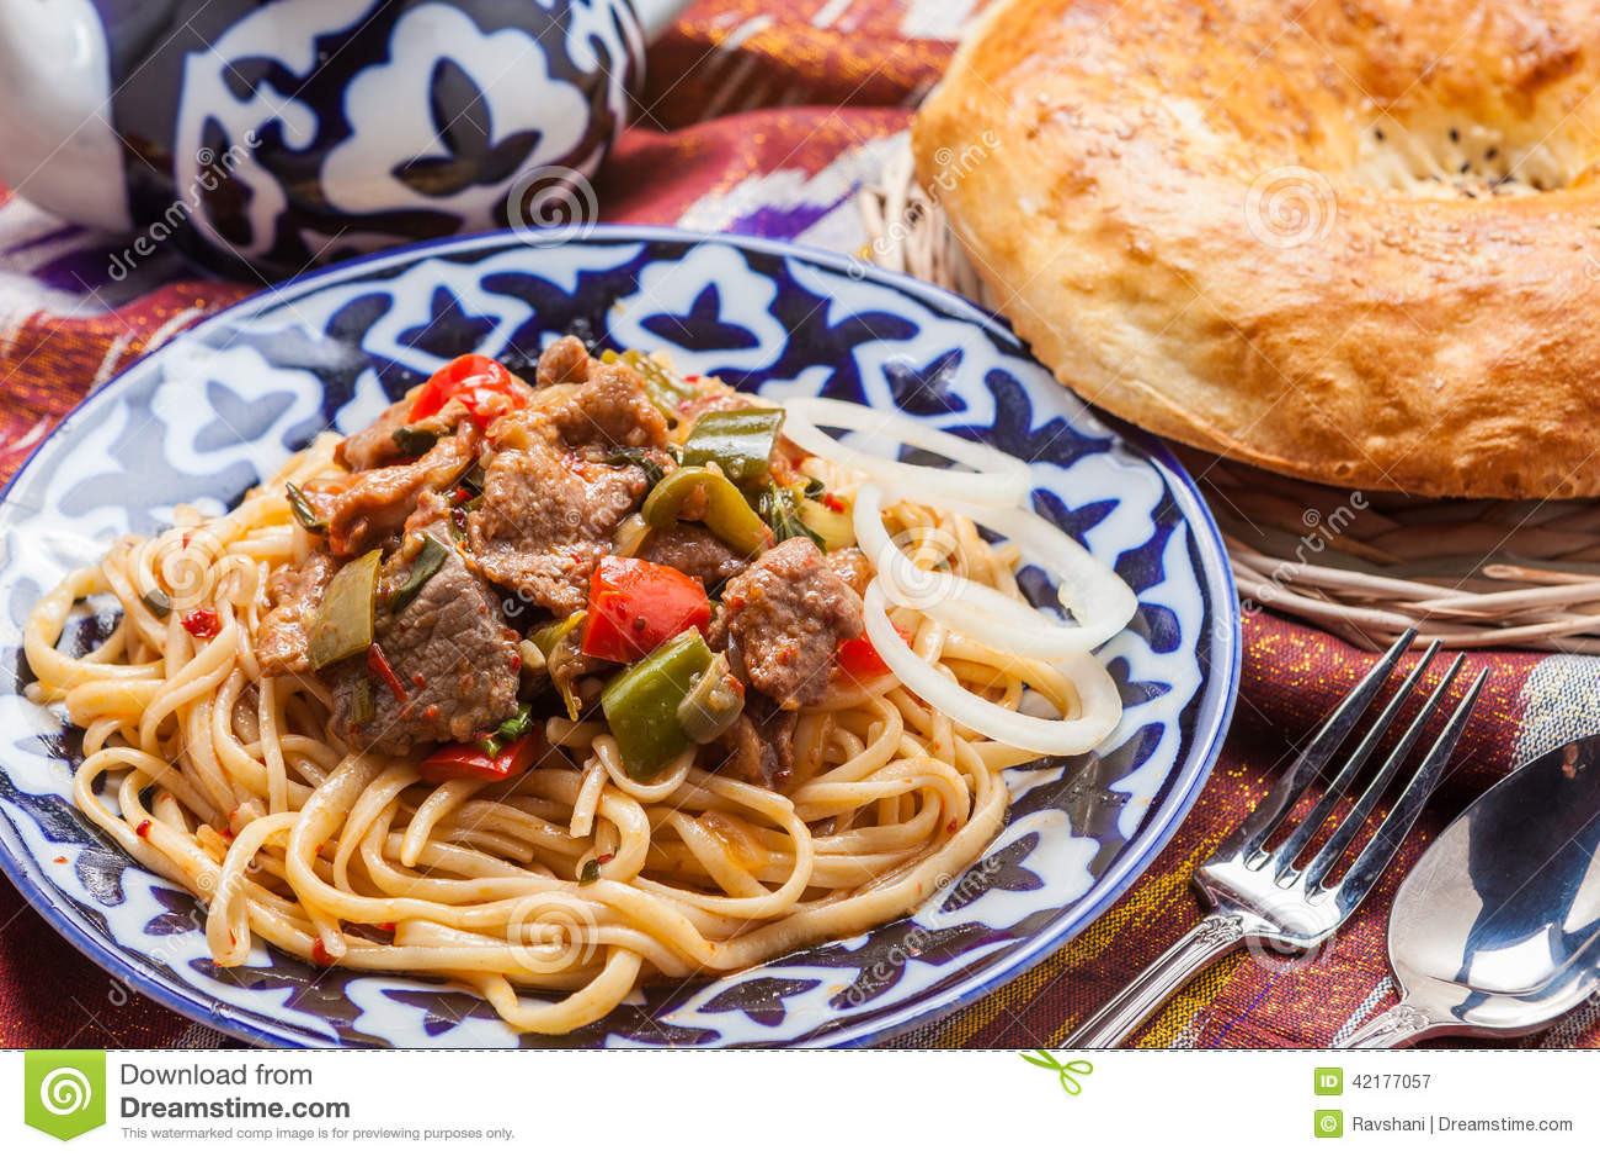 Uzbek national food lagman on traditional fabric adras for Atlas house uzbek cuisine